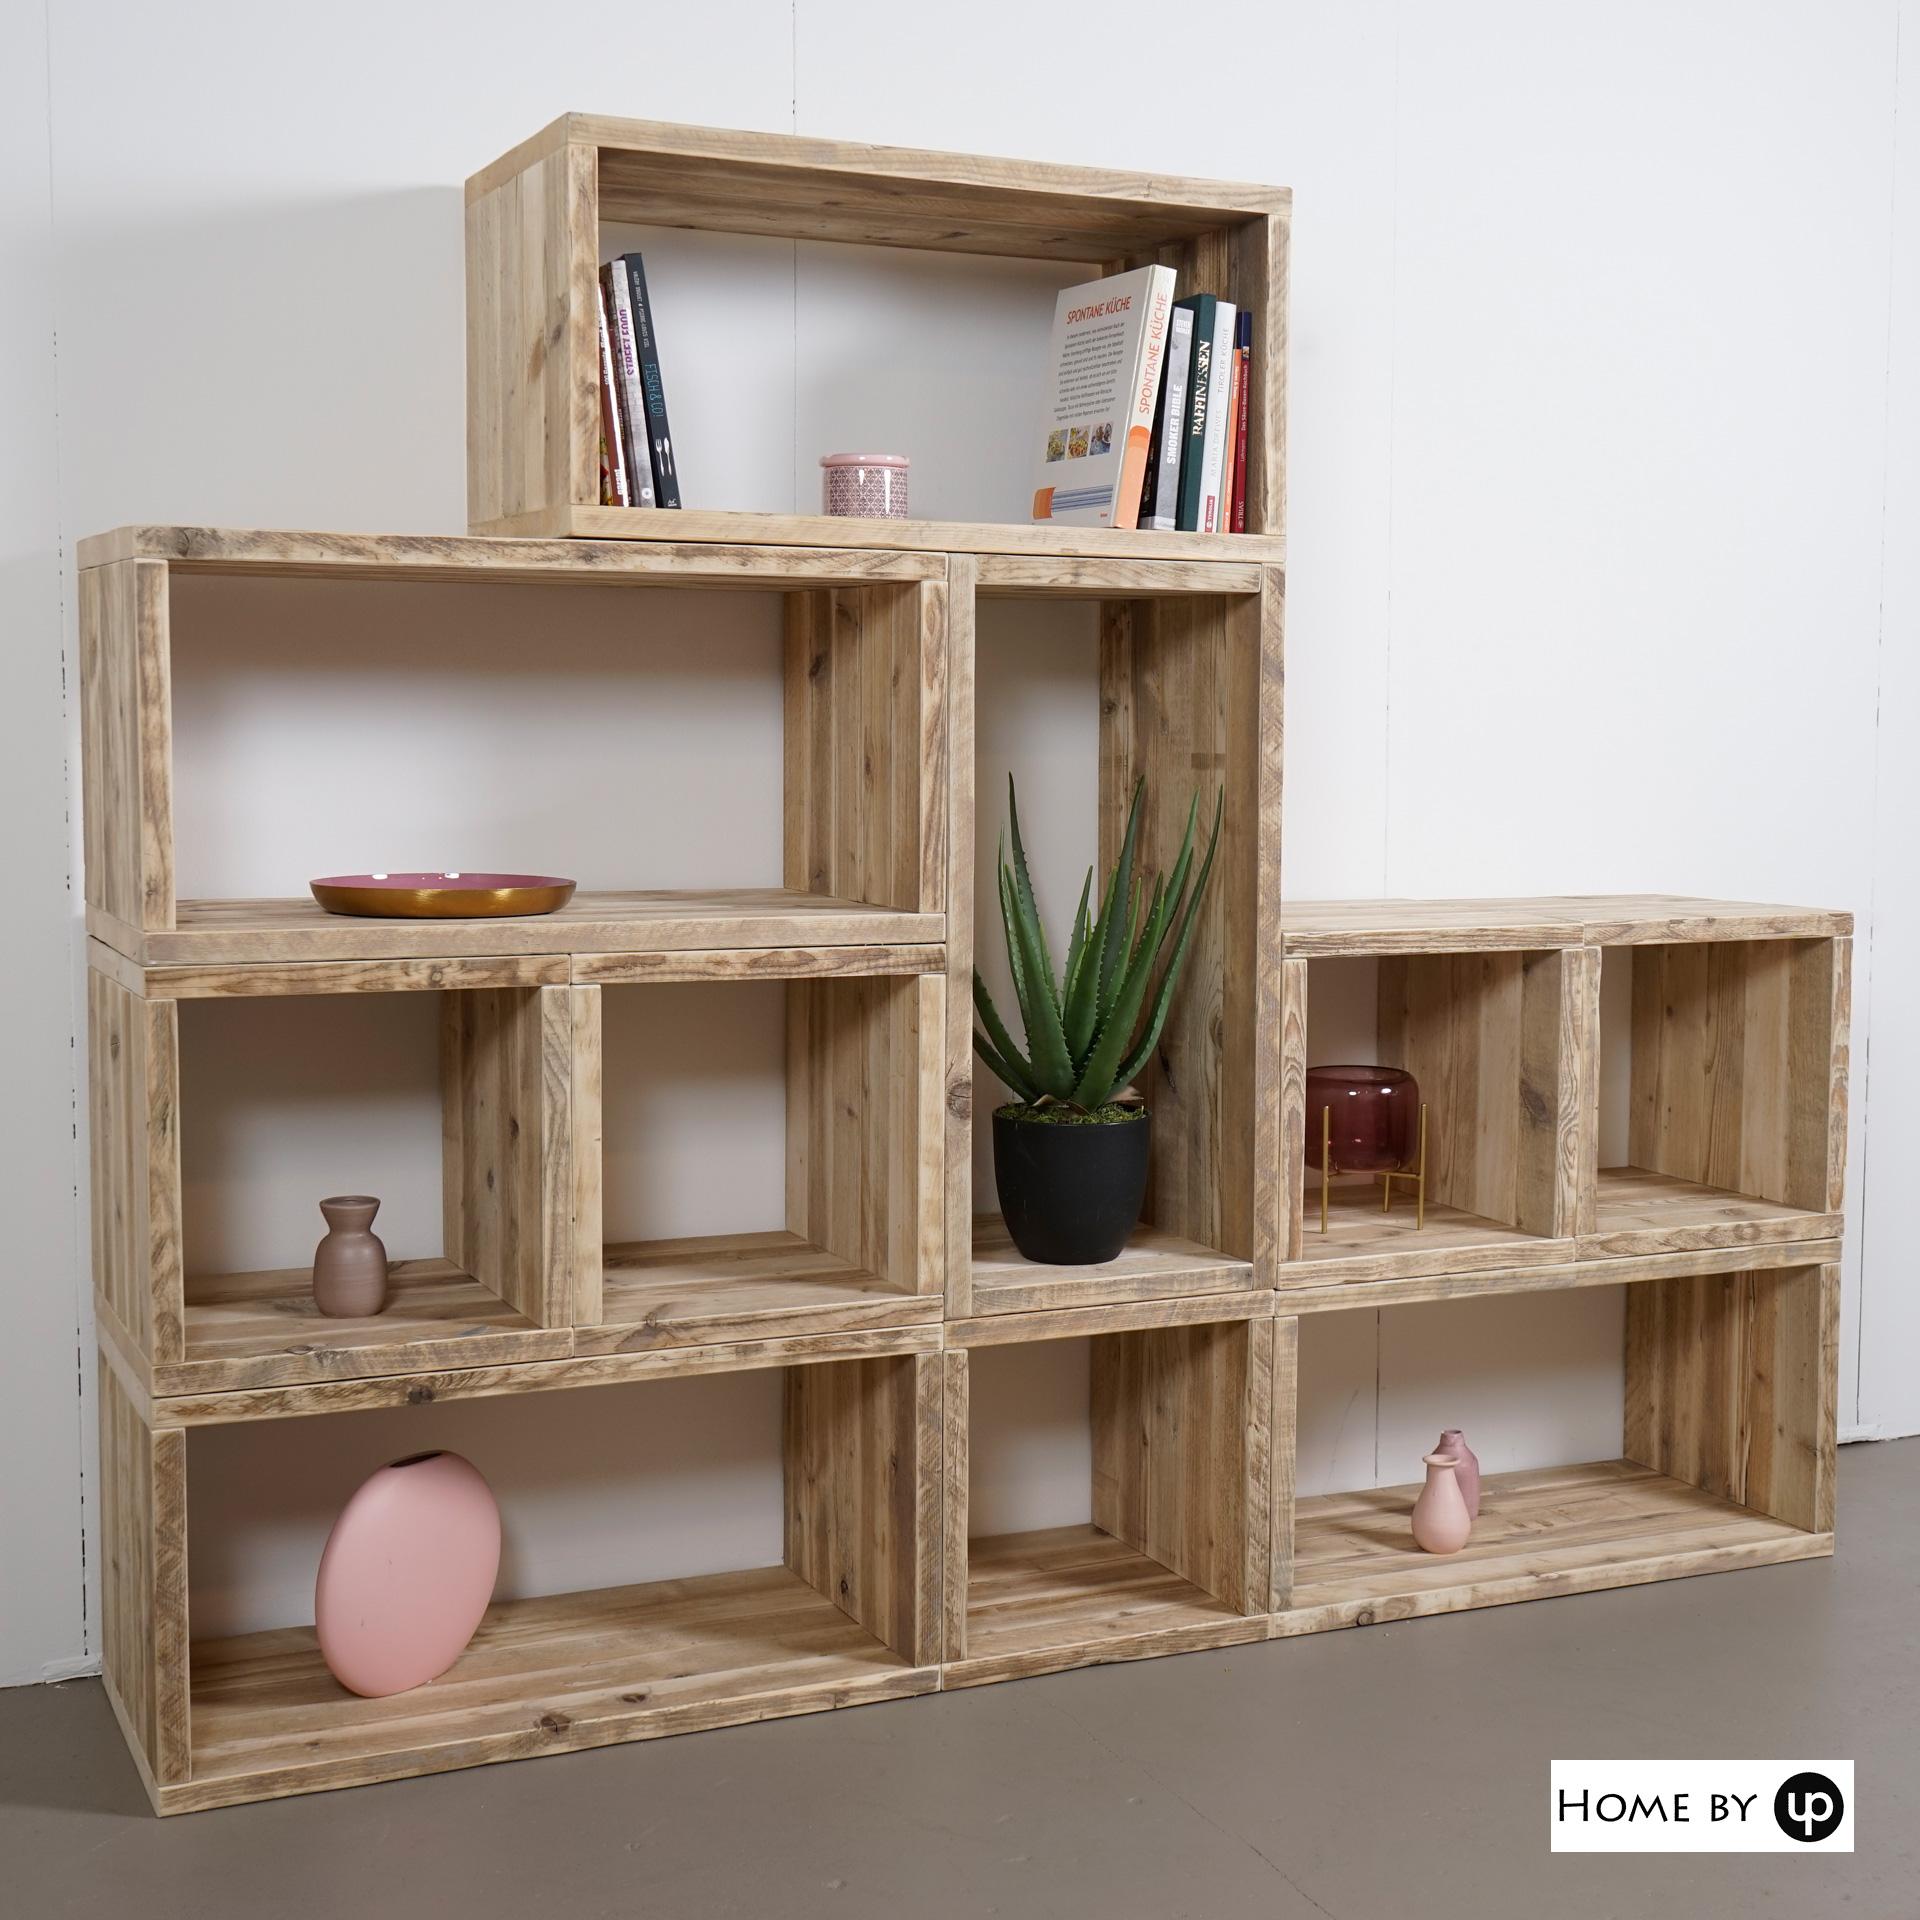 Cube Set  10-teilig, Bauholz Design